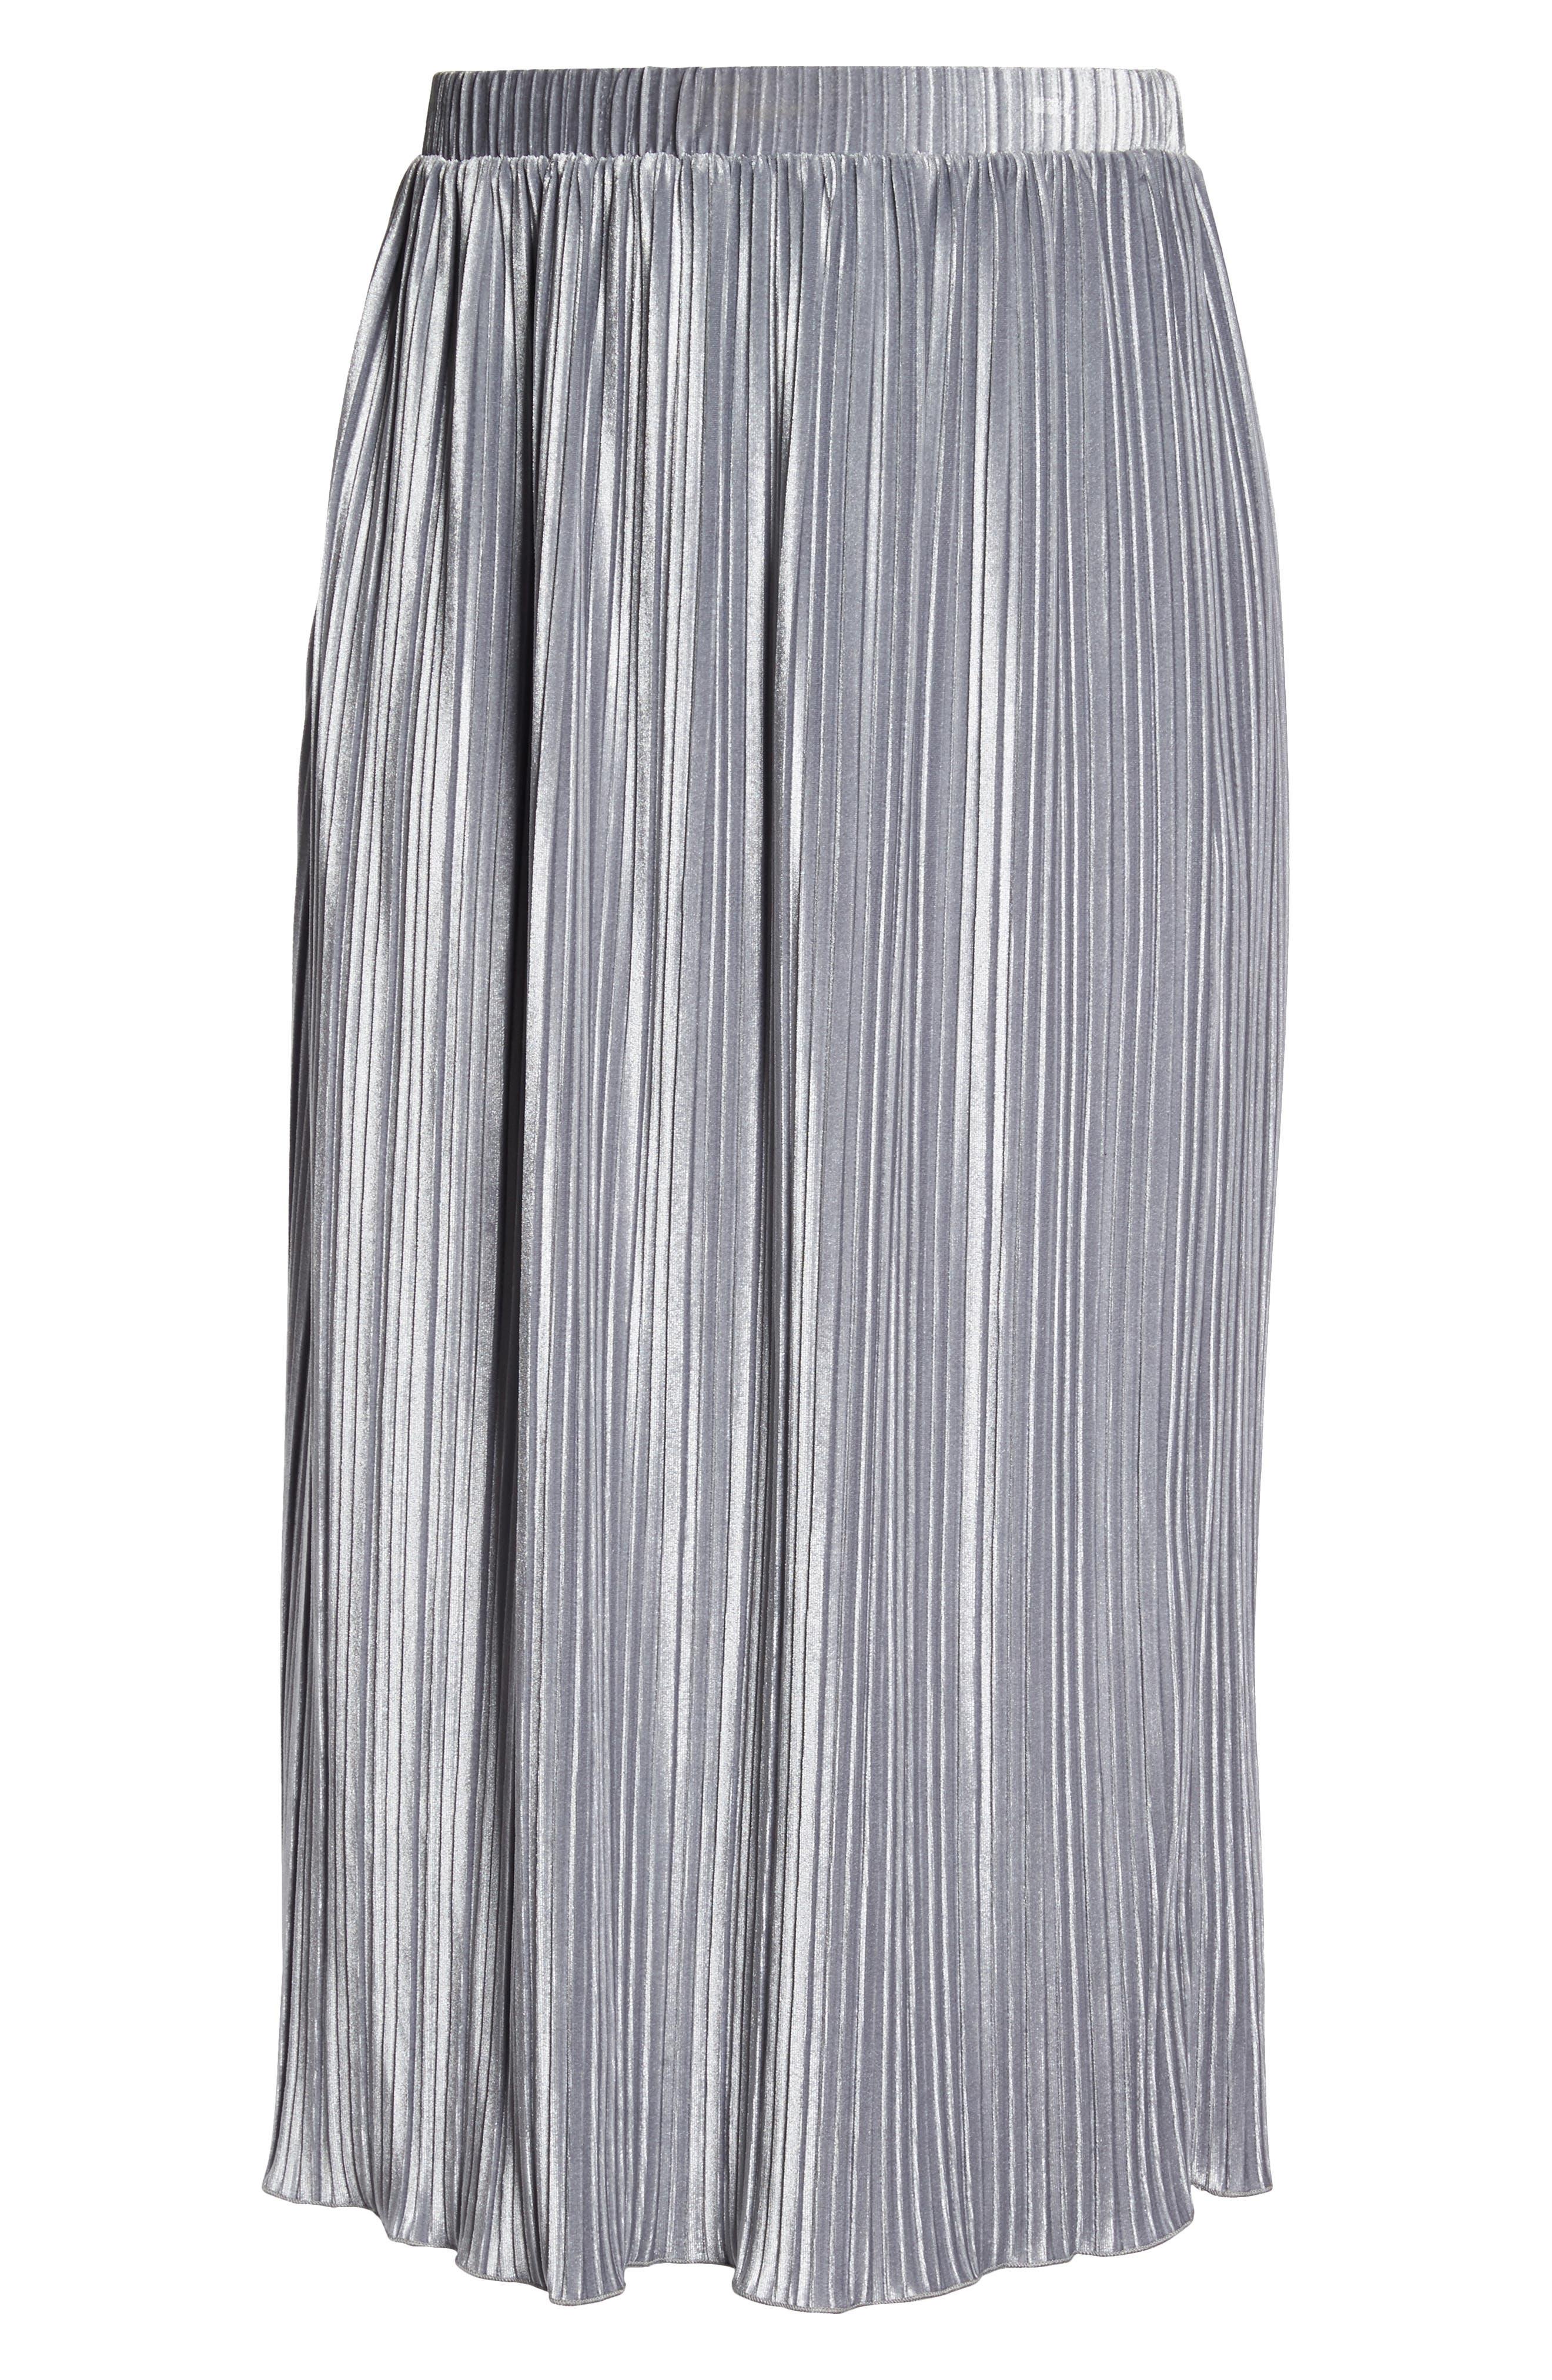 Pleat Velour Midi Skirt,                             Alternate thumbnail 7, color,                             Grey